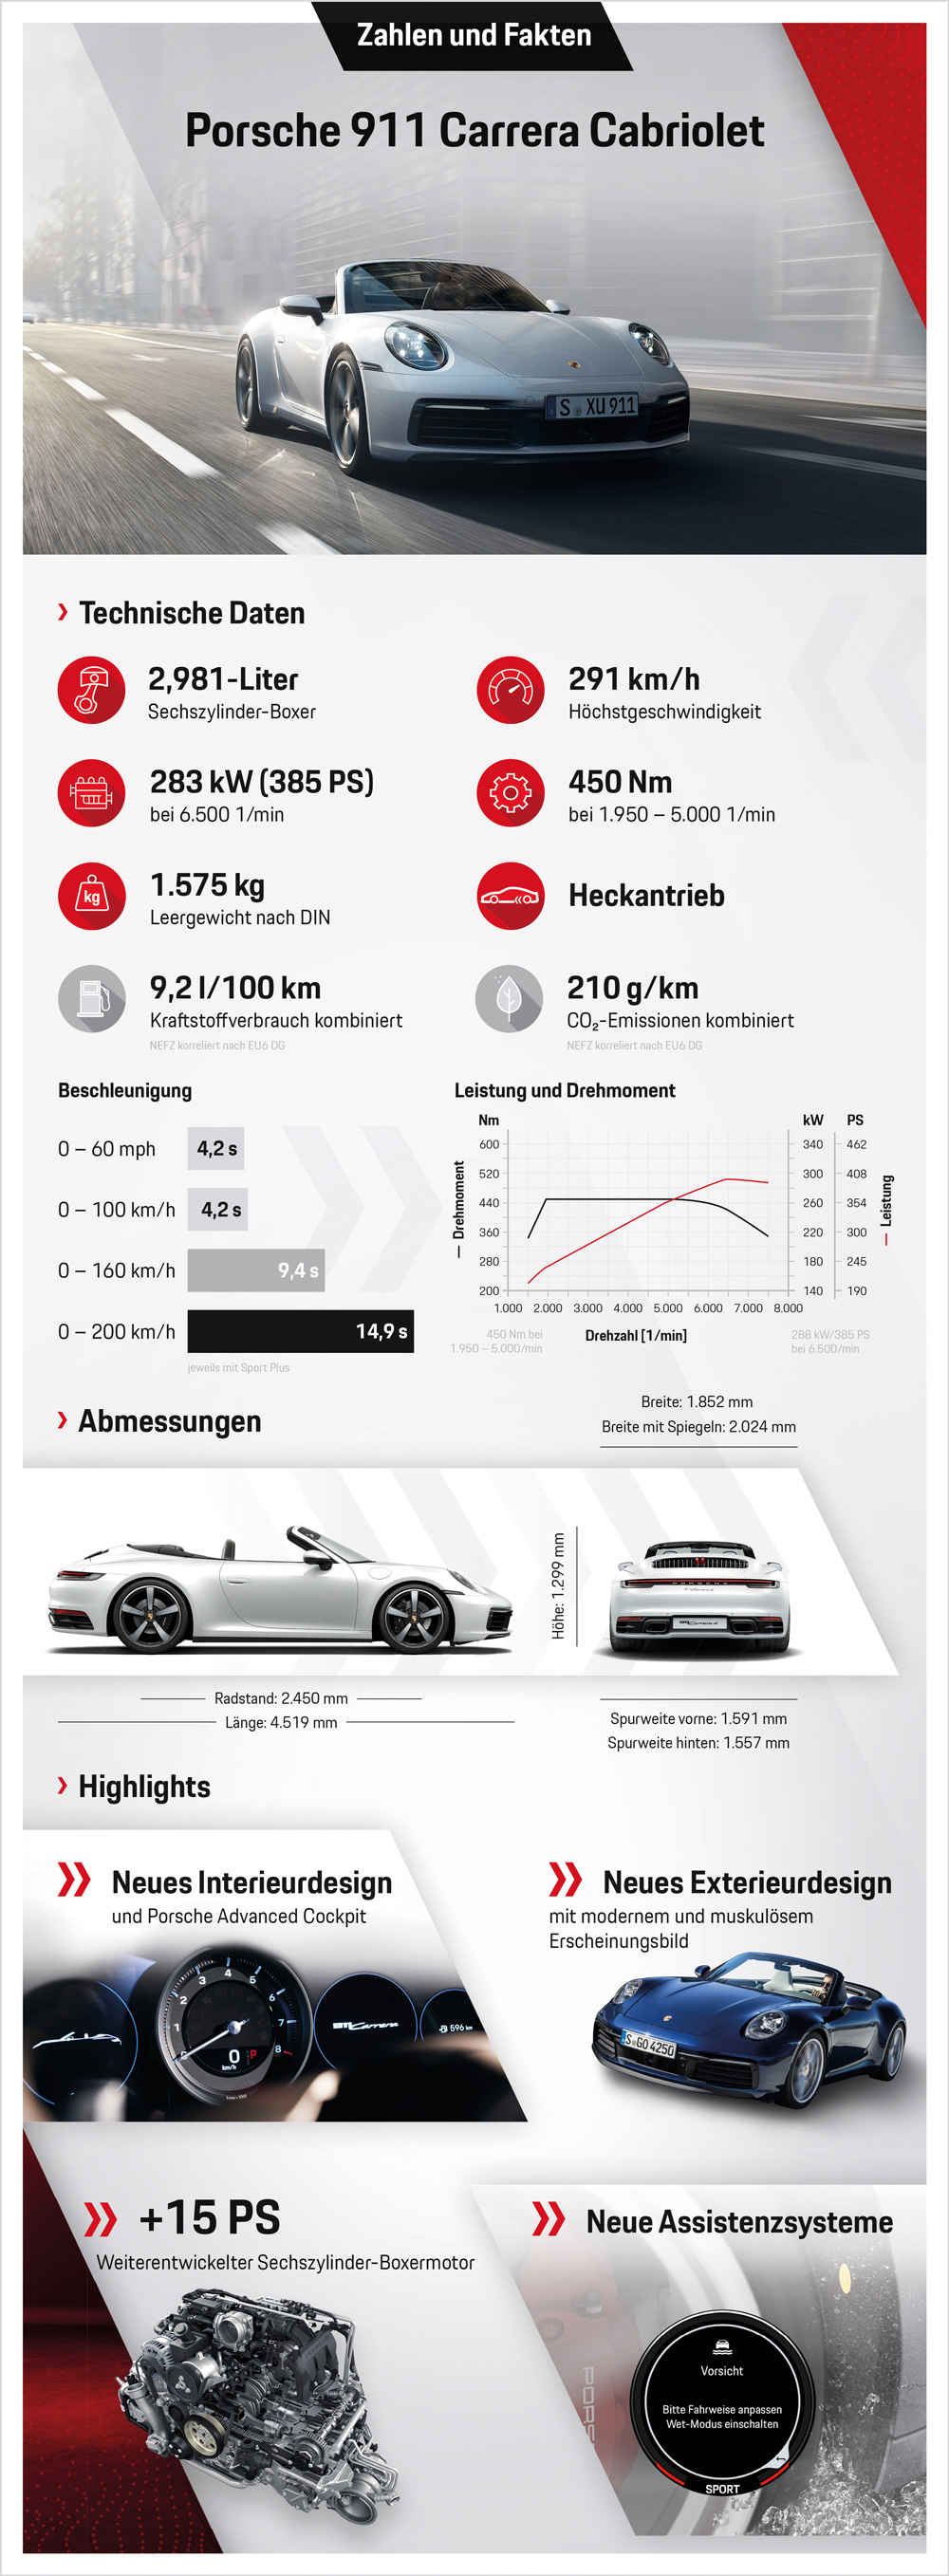 Infografik: 911 Carrera Cabriolet